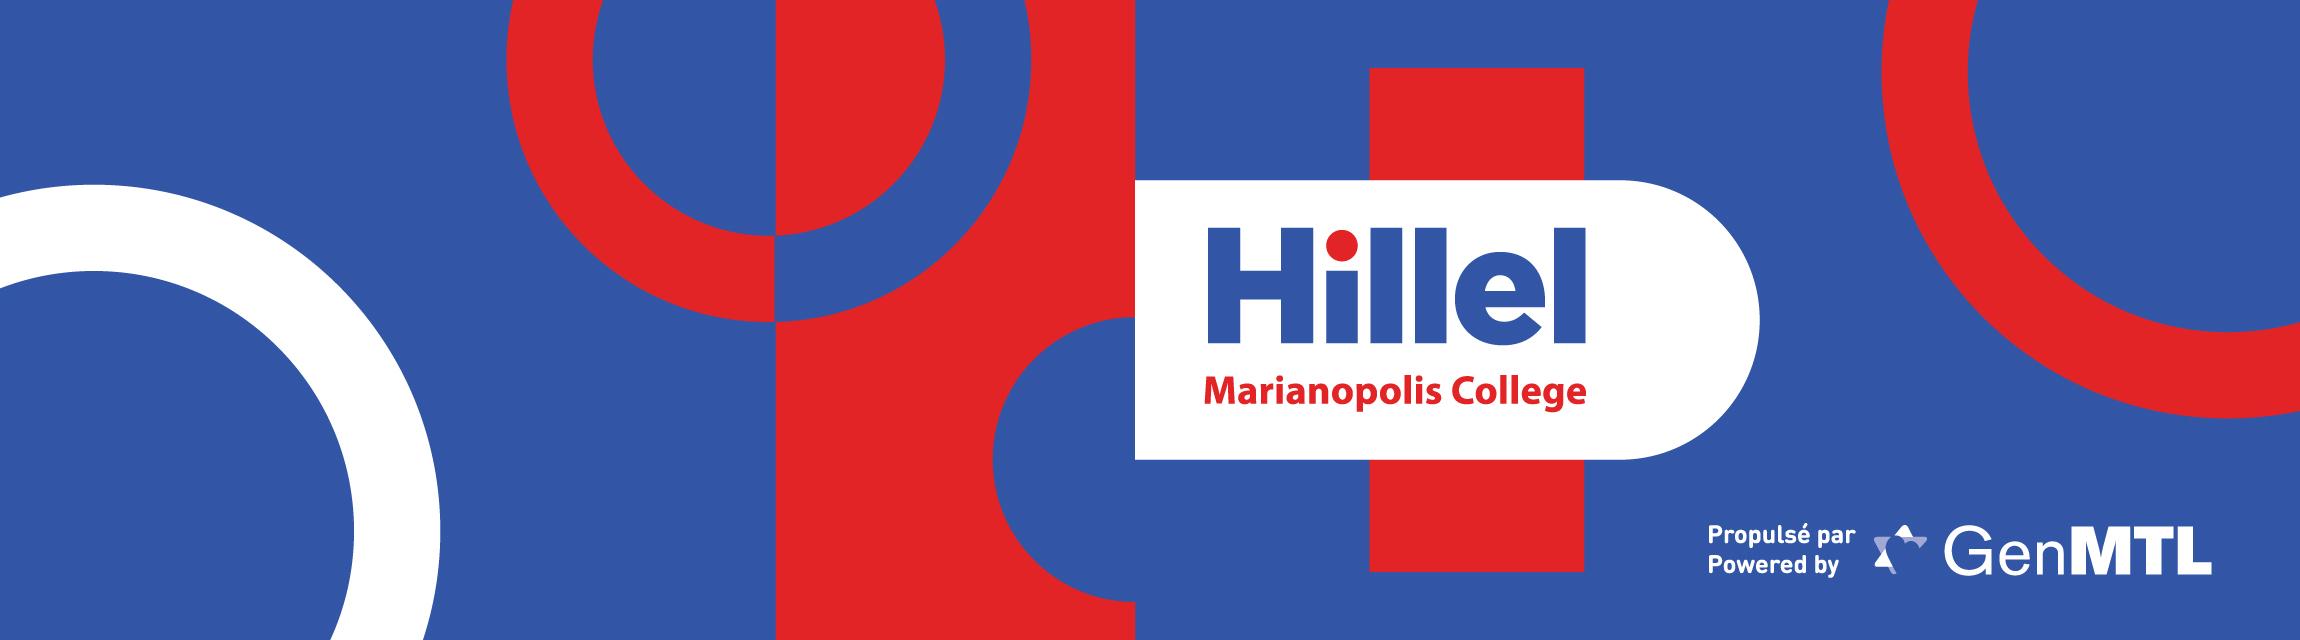 hil-21155_jlivebanners_marianopolis_2300x640-20210607-191139.jpg